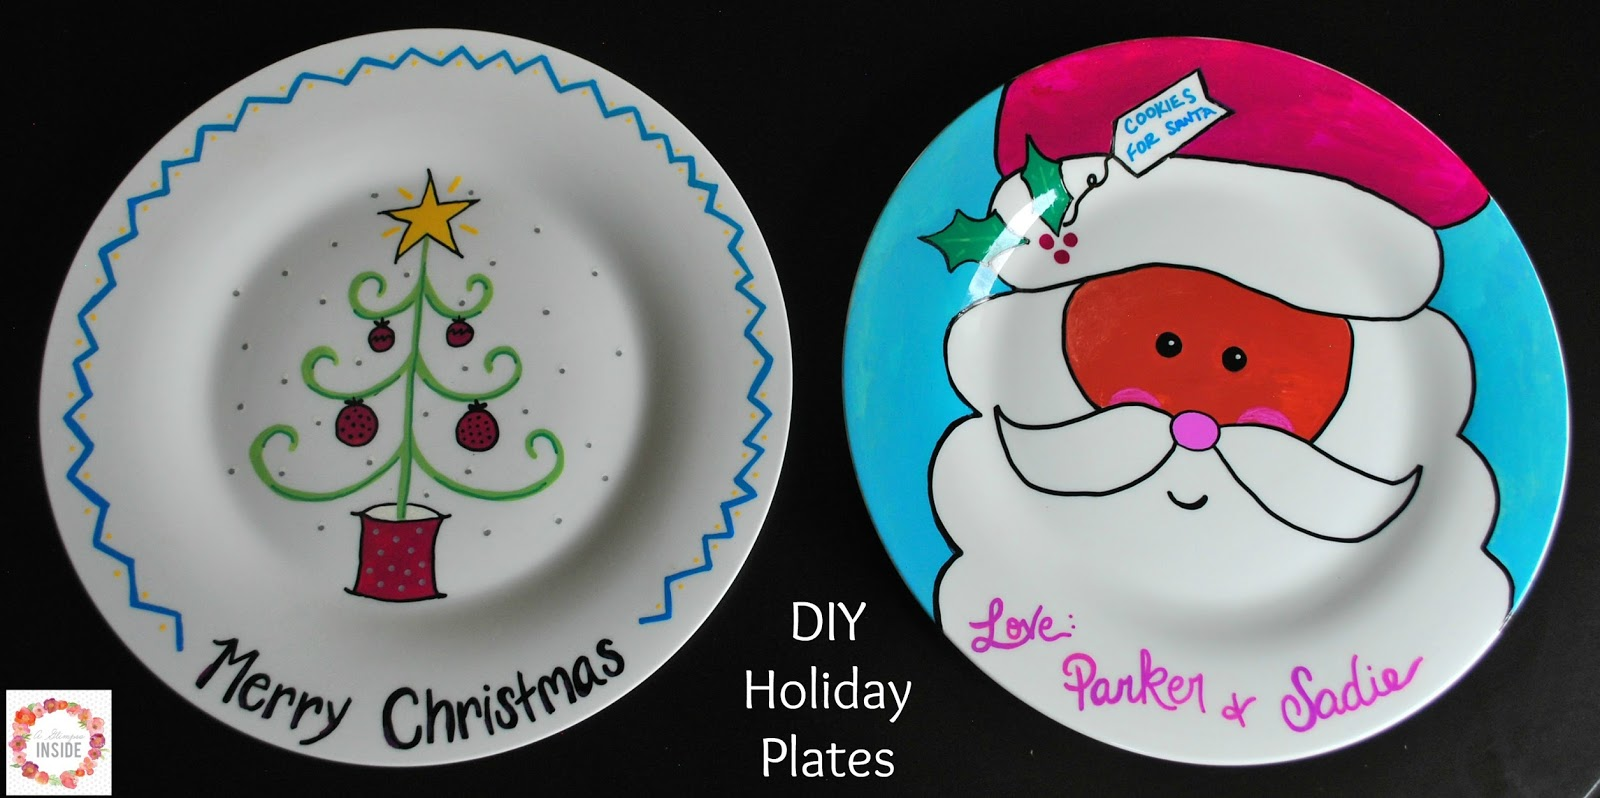 diy holiday plates a glimpse inside